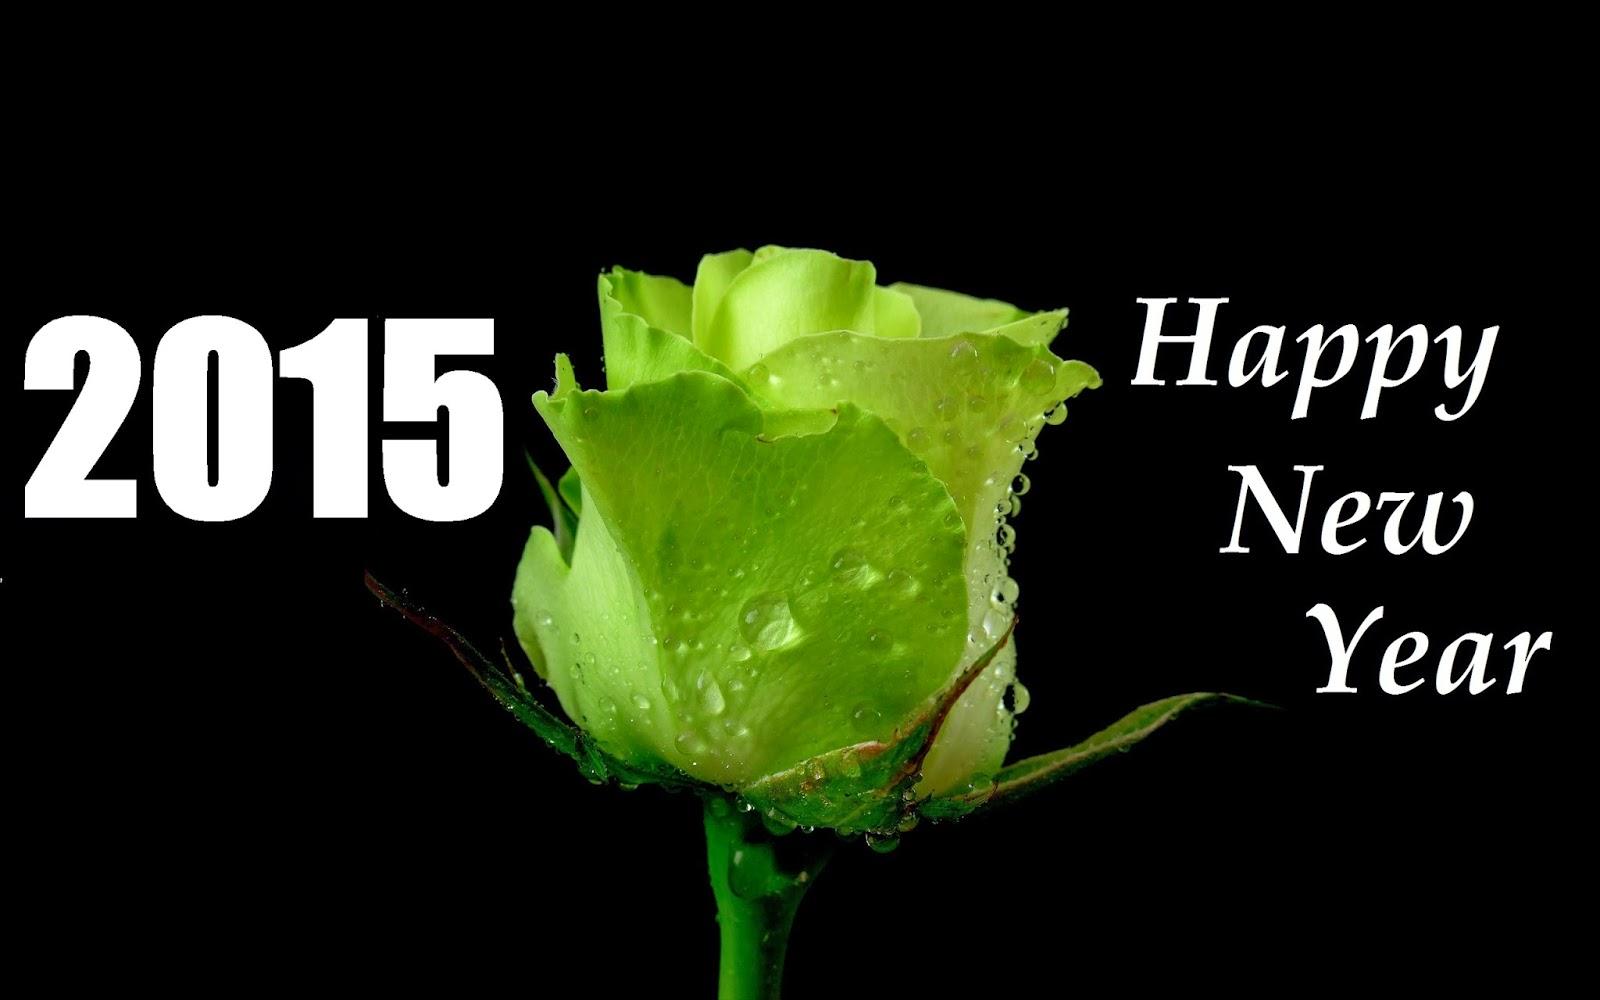 Green rose happy new year 2015 greetings wallpaper kristyandbryce Gallery